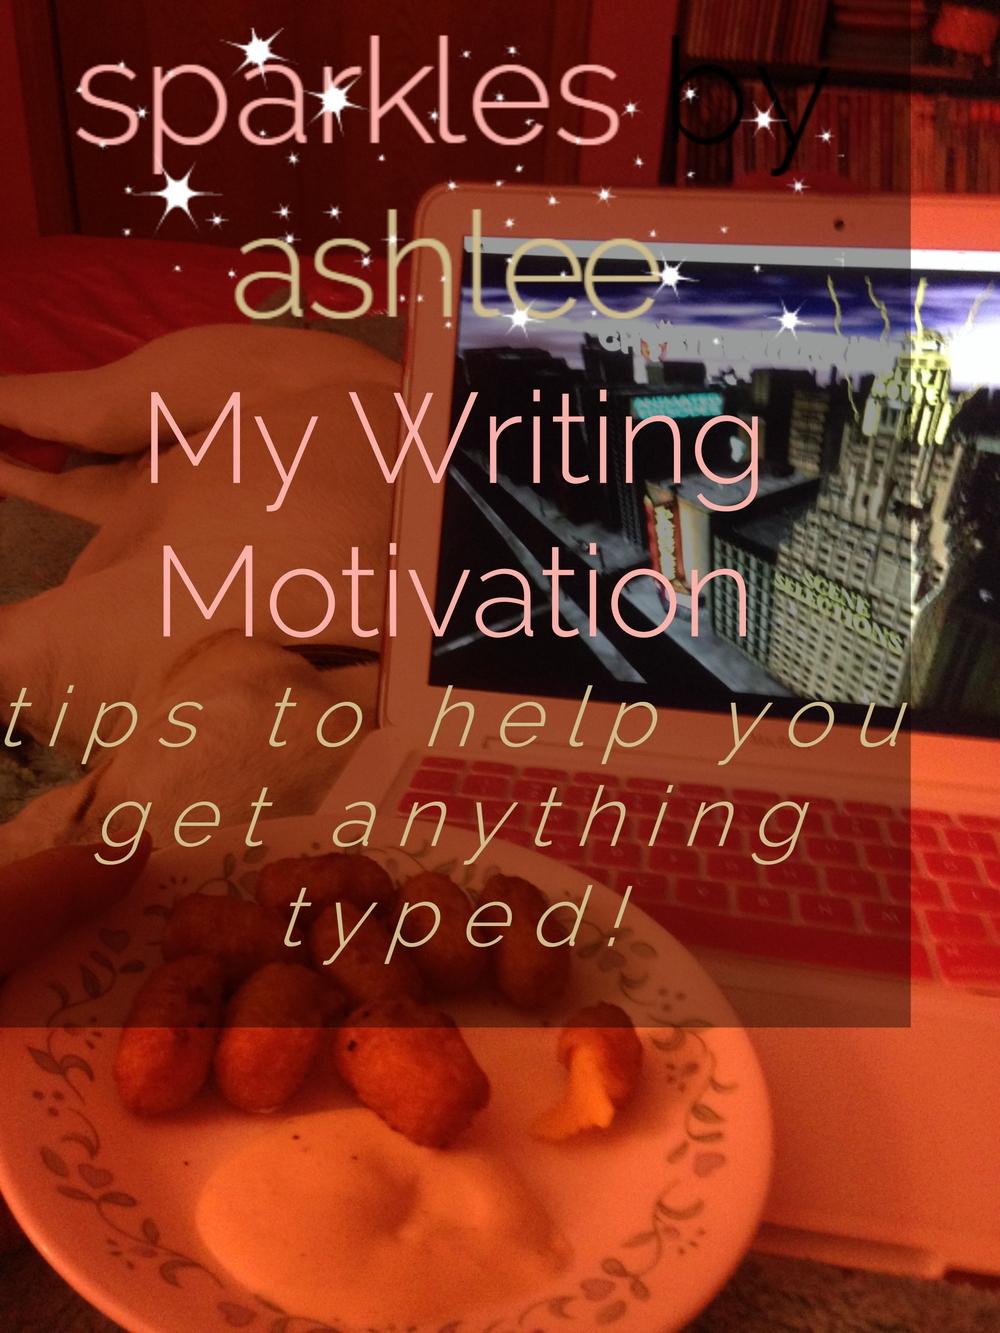 My-Writing-Motivation-Sparkles-by-Ashlee.jpg